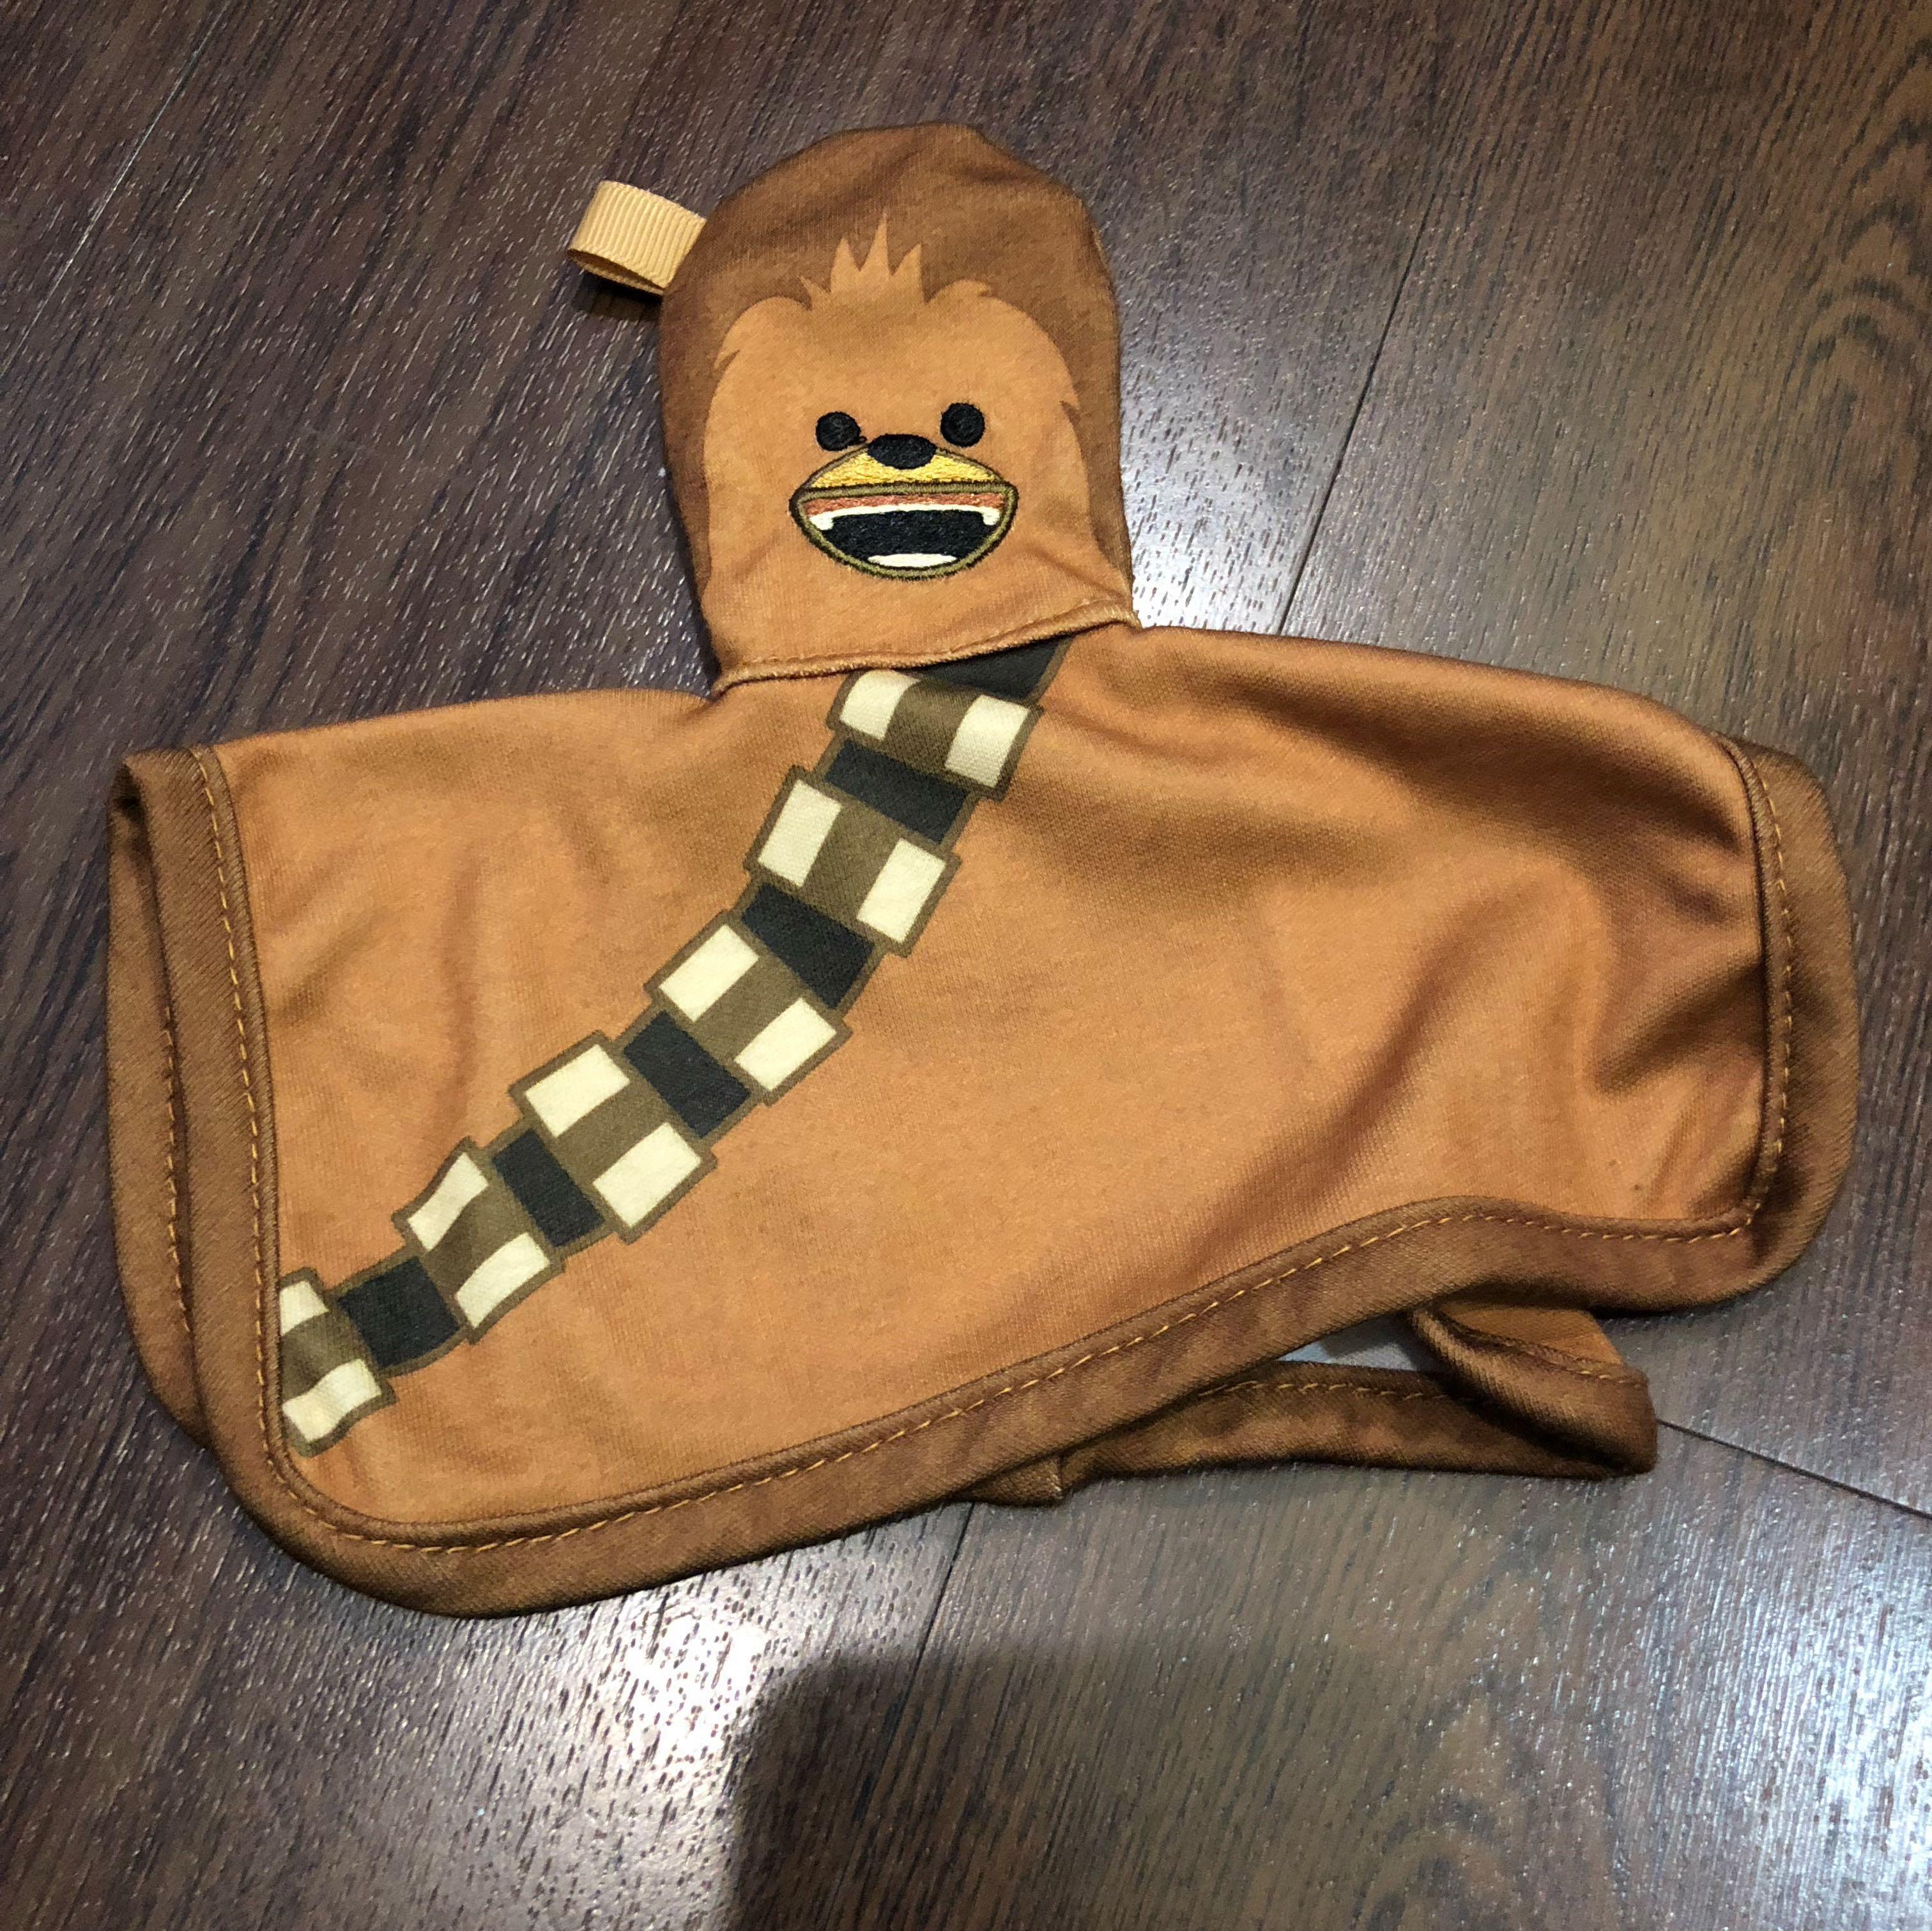 puppet star wars chewbacca #yukjualan